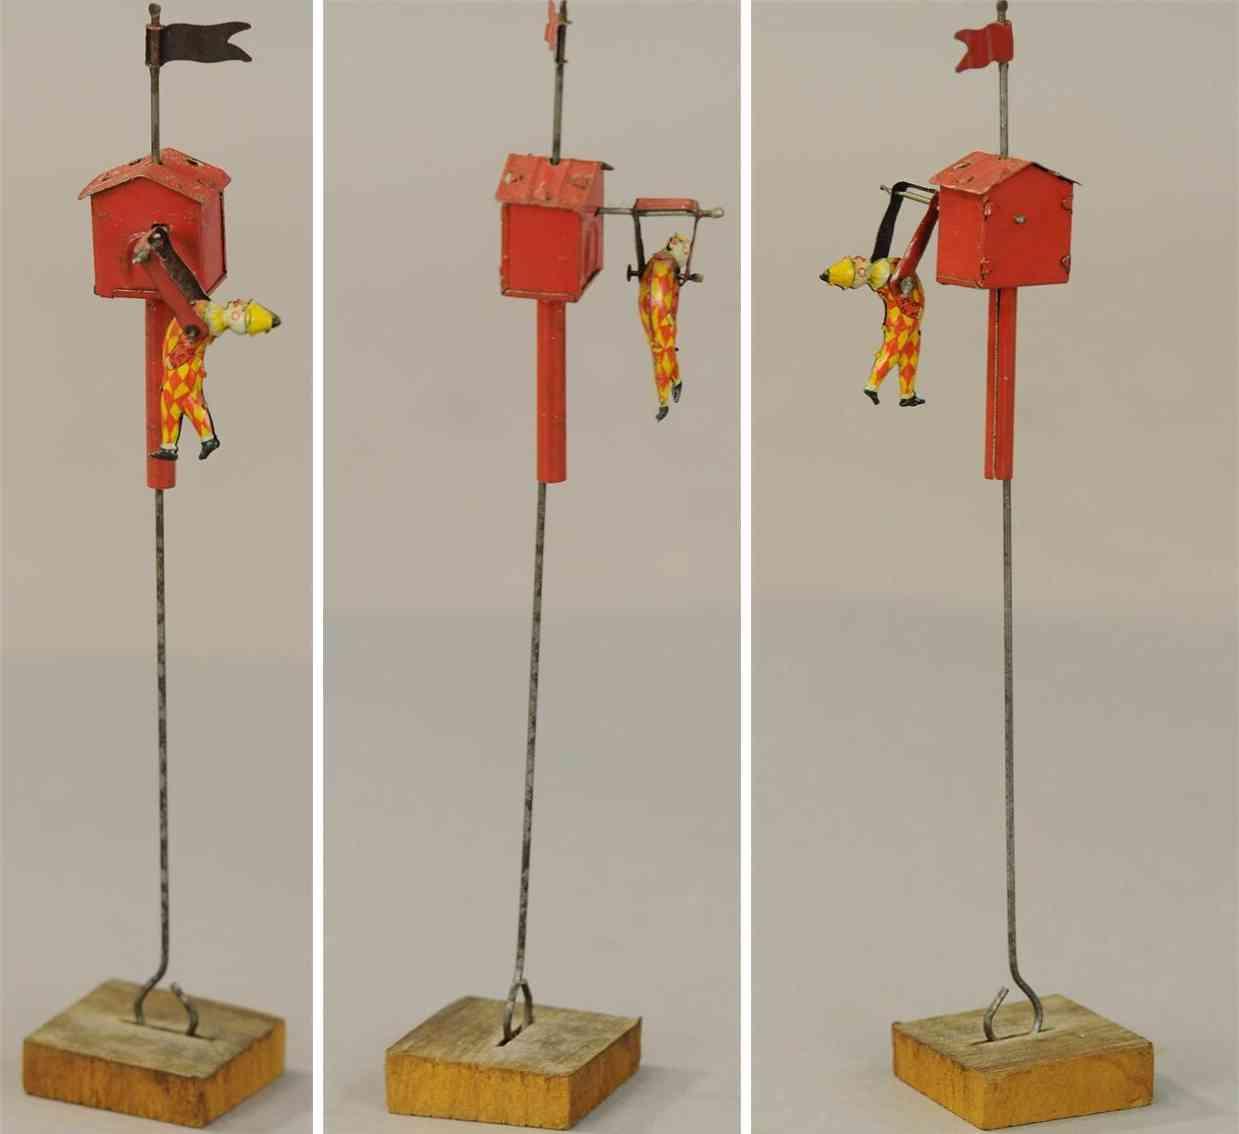 distler johann 302 penny toy turnender clown schlaegt purzelbaum